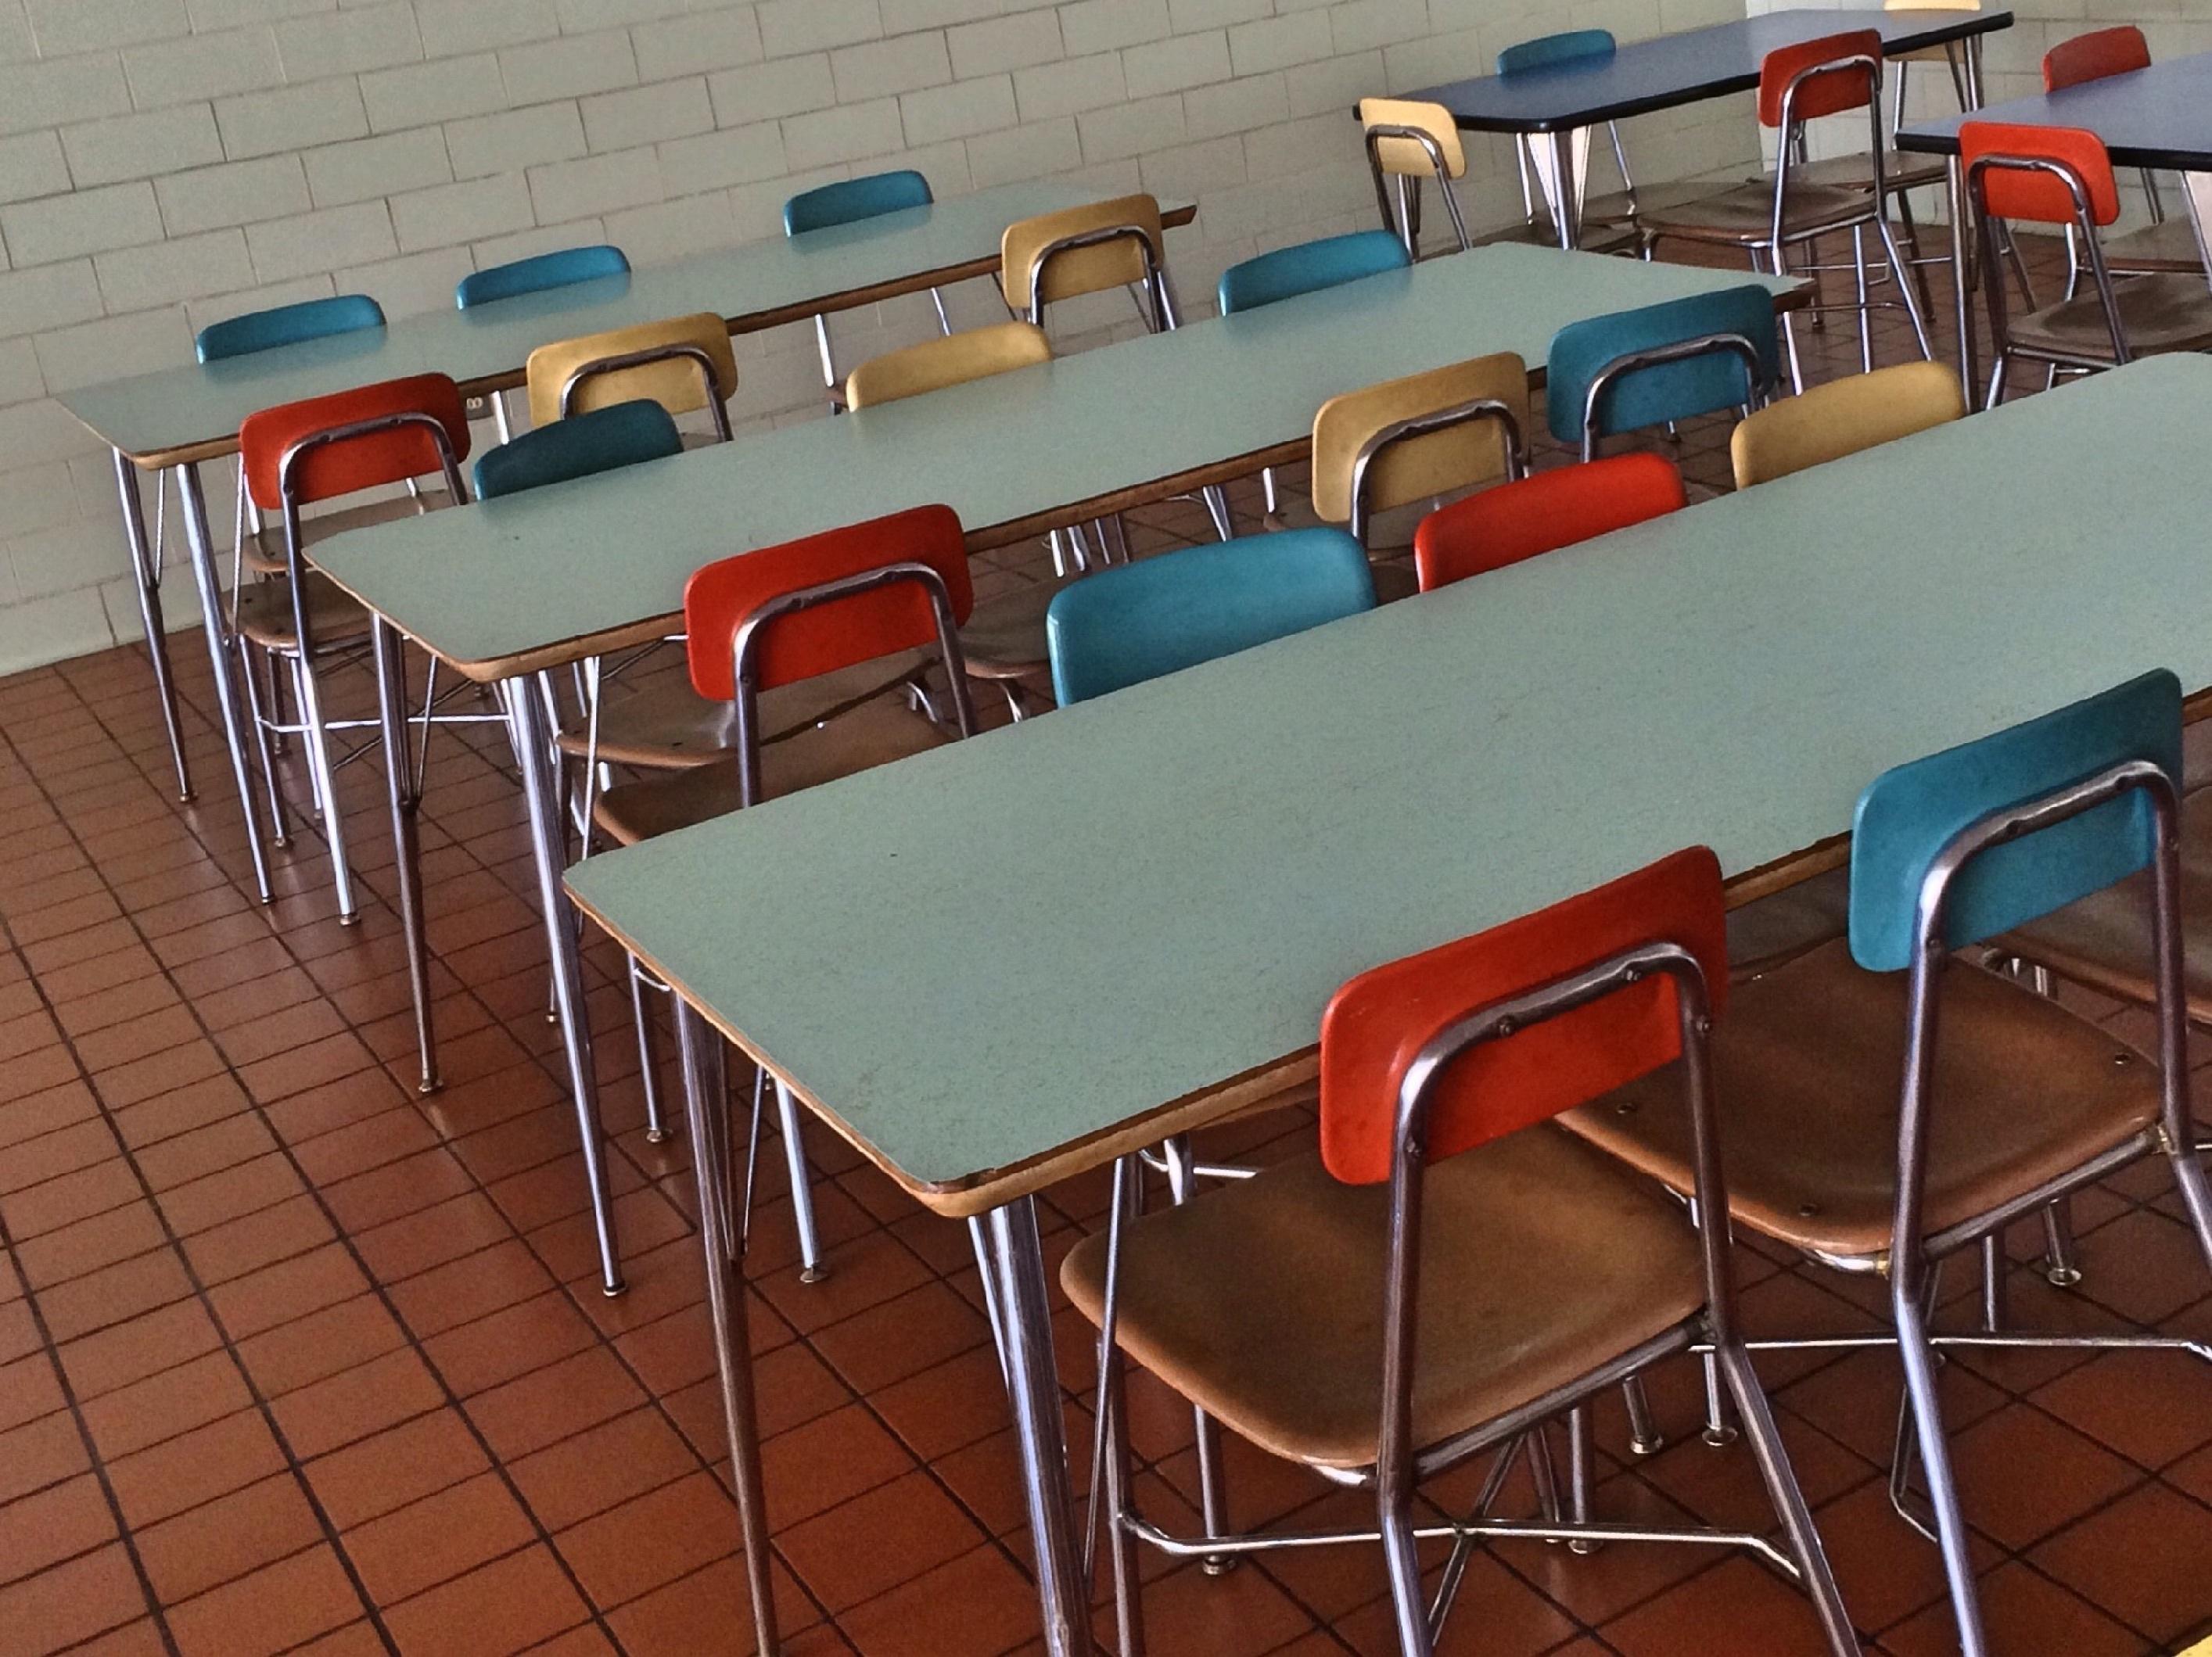 Fotos gratis : mesa, cafetería, restaurante, bar, comida, estudiante ...